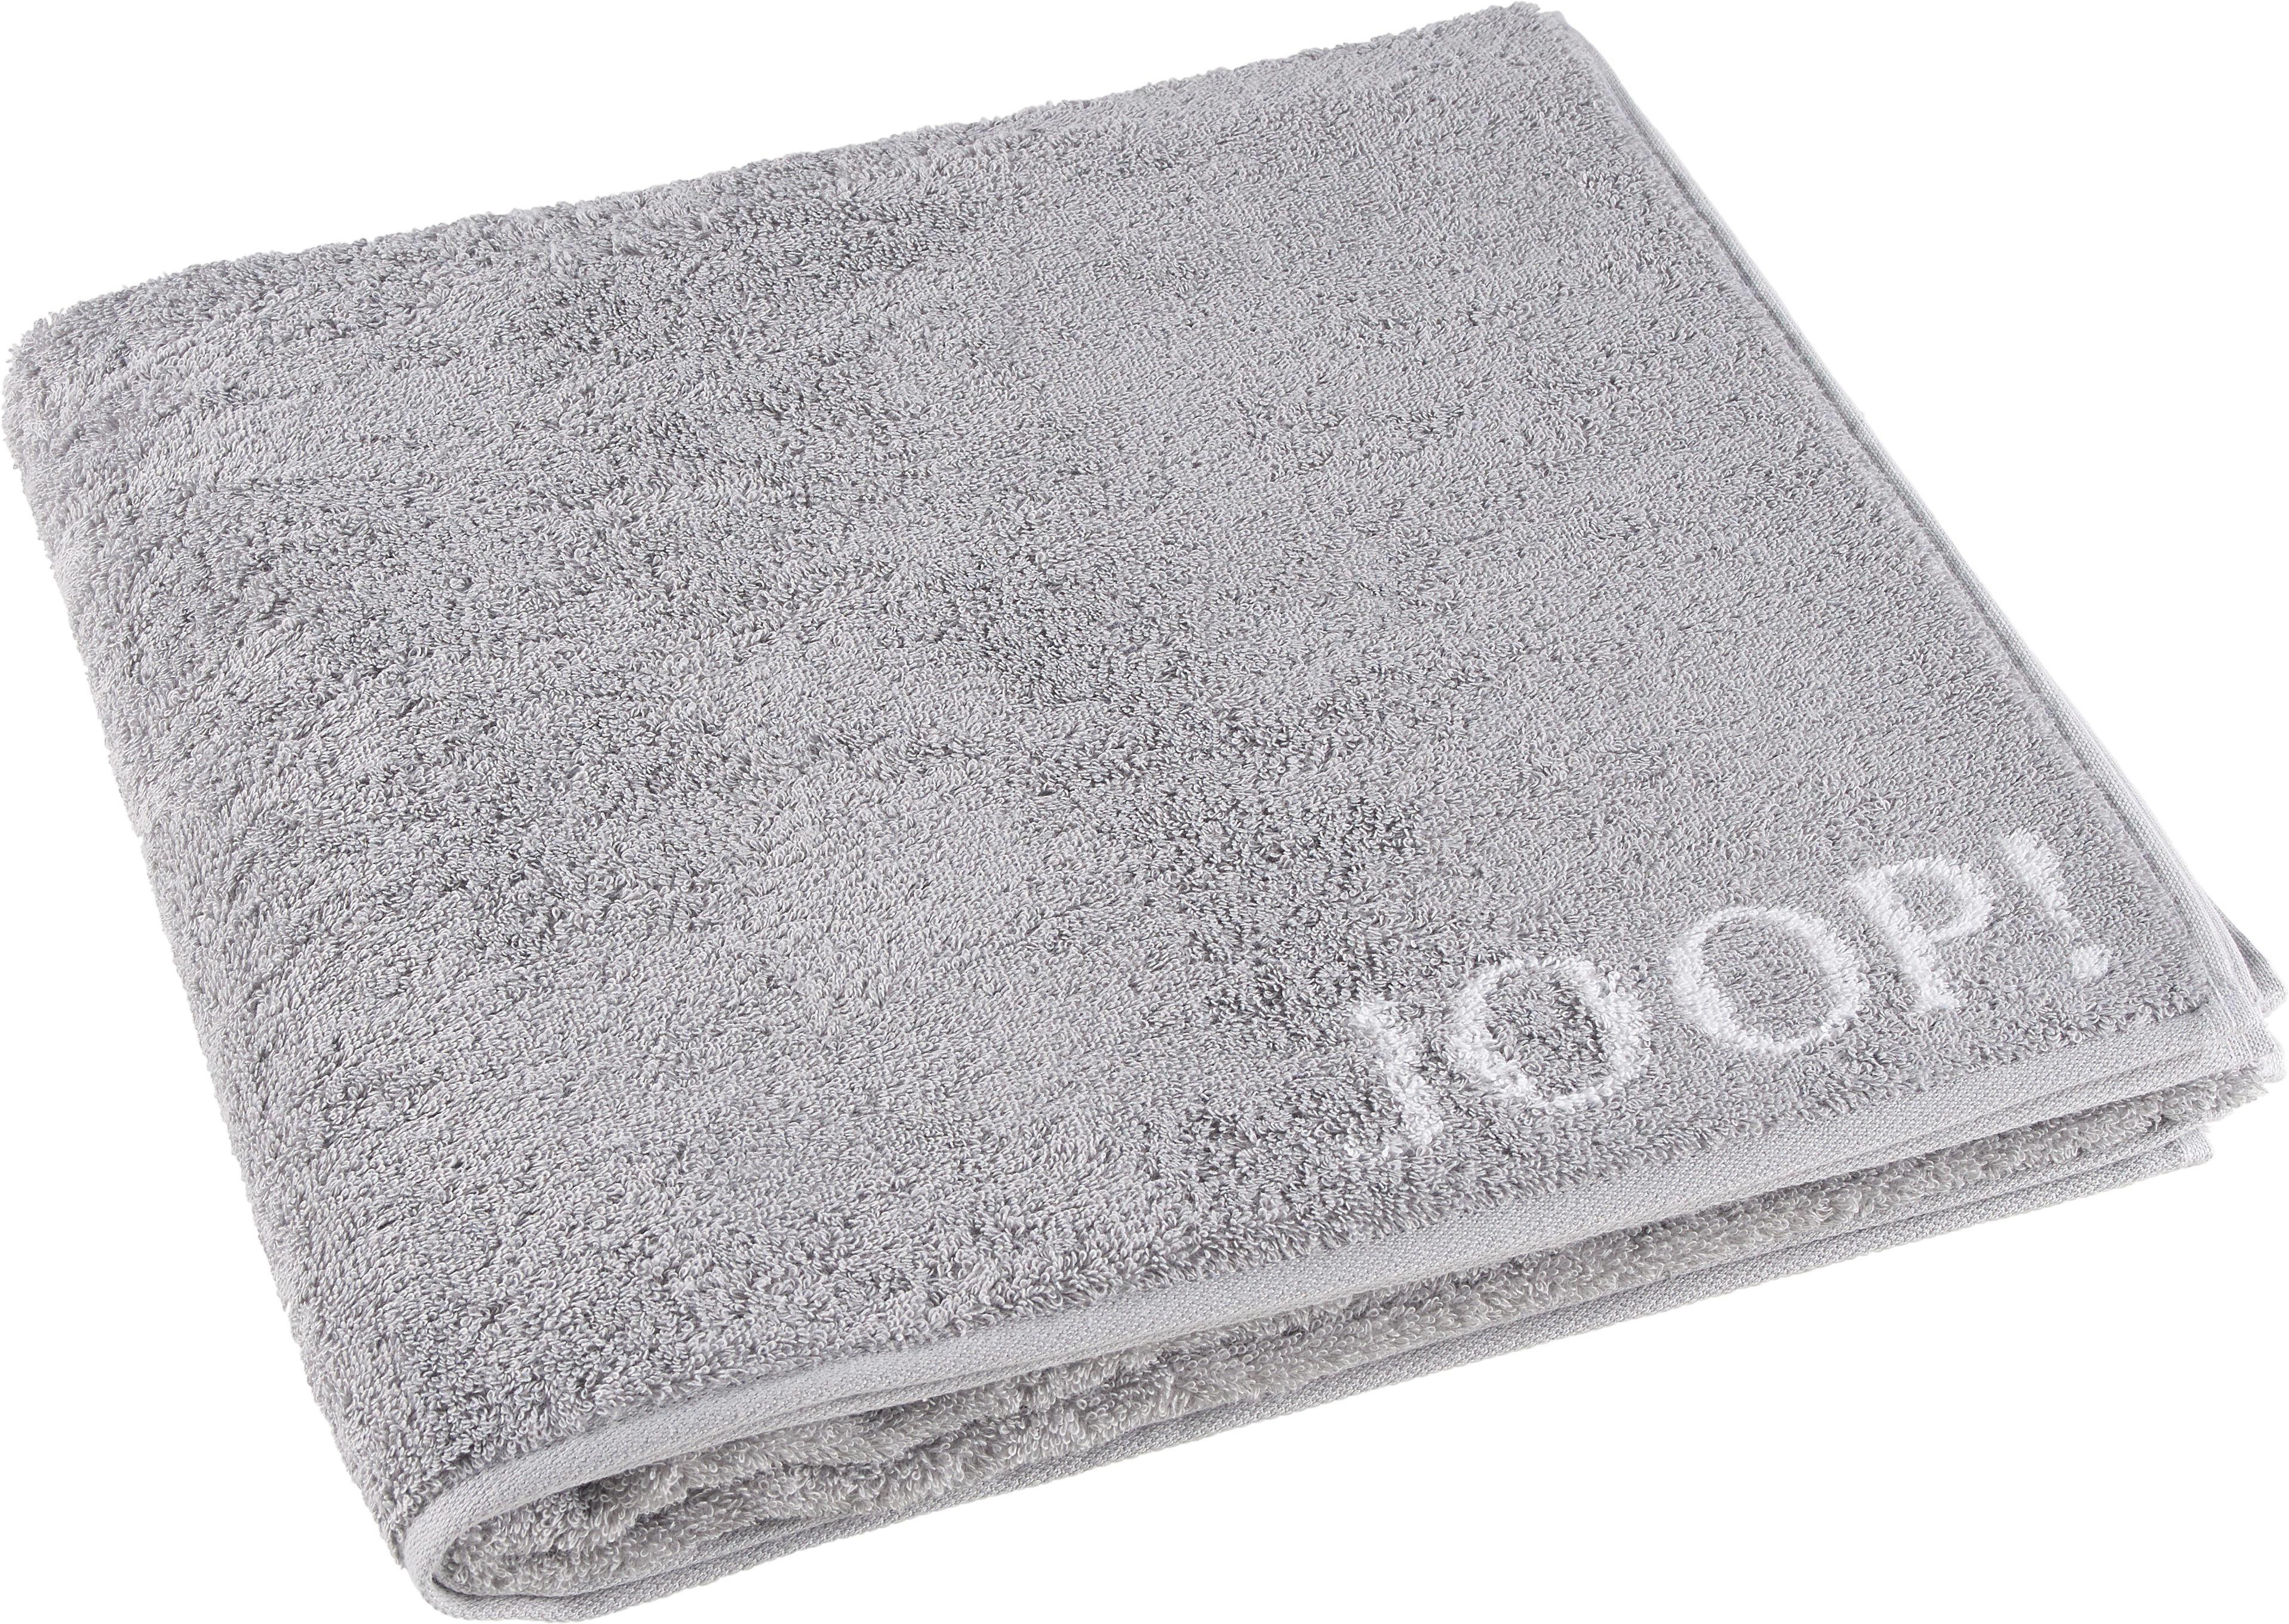 DUSCHTUCH 80/150 cm - Hellgrau, Basics, Textil (80/150cm) - JOOP!